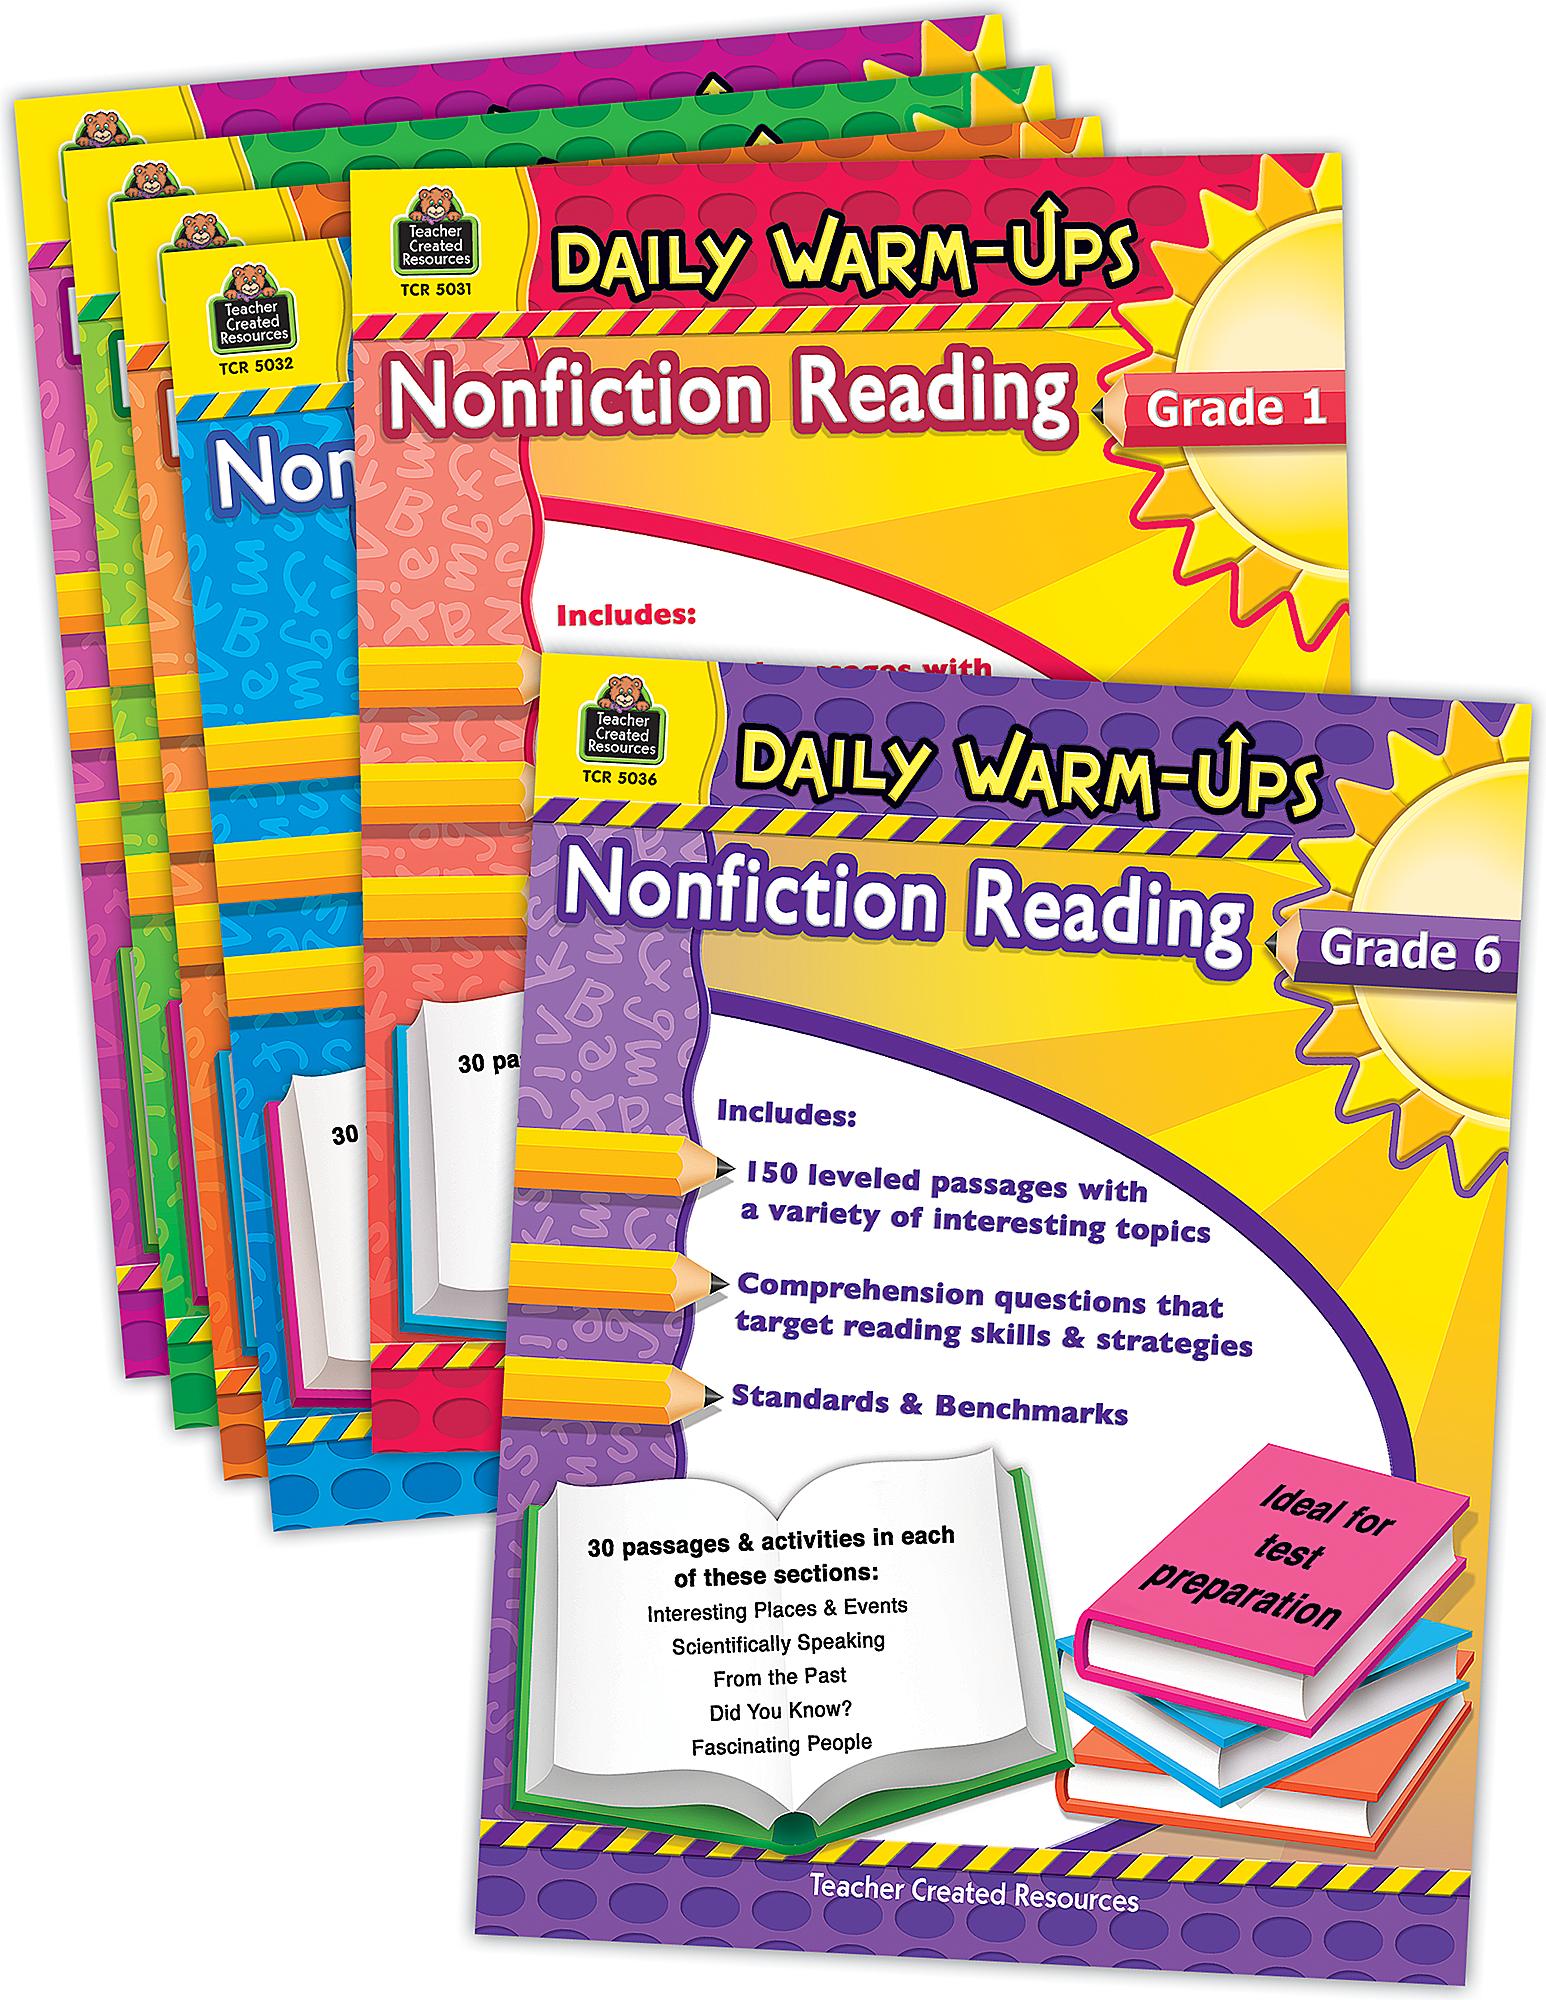 Daily Warm-Ups: Nonfiction Reading Set (6 bks)